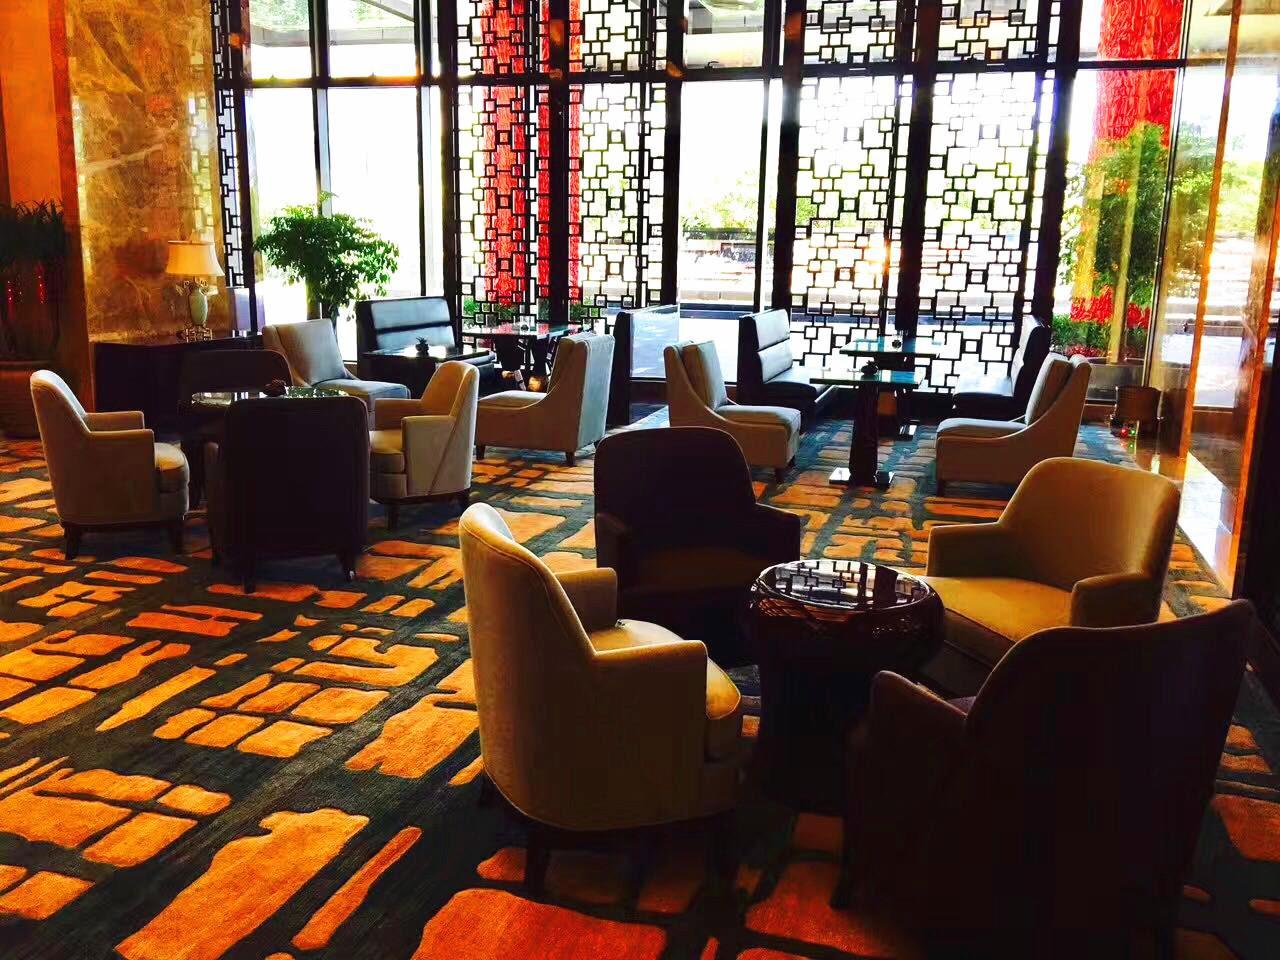 Review Peony Harbor City Hotel